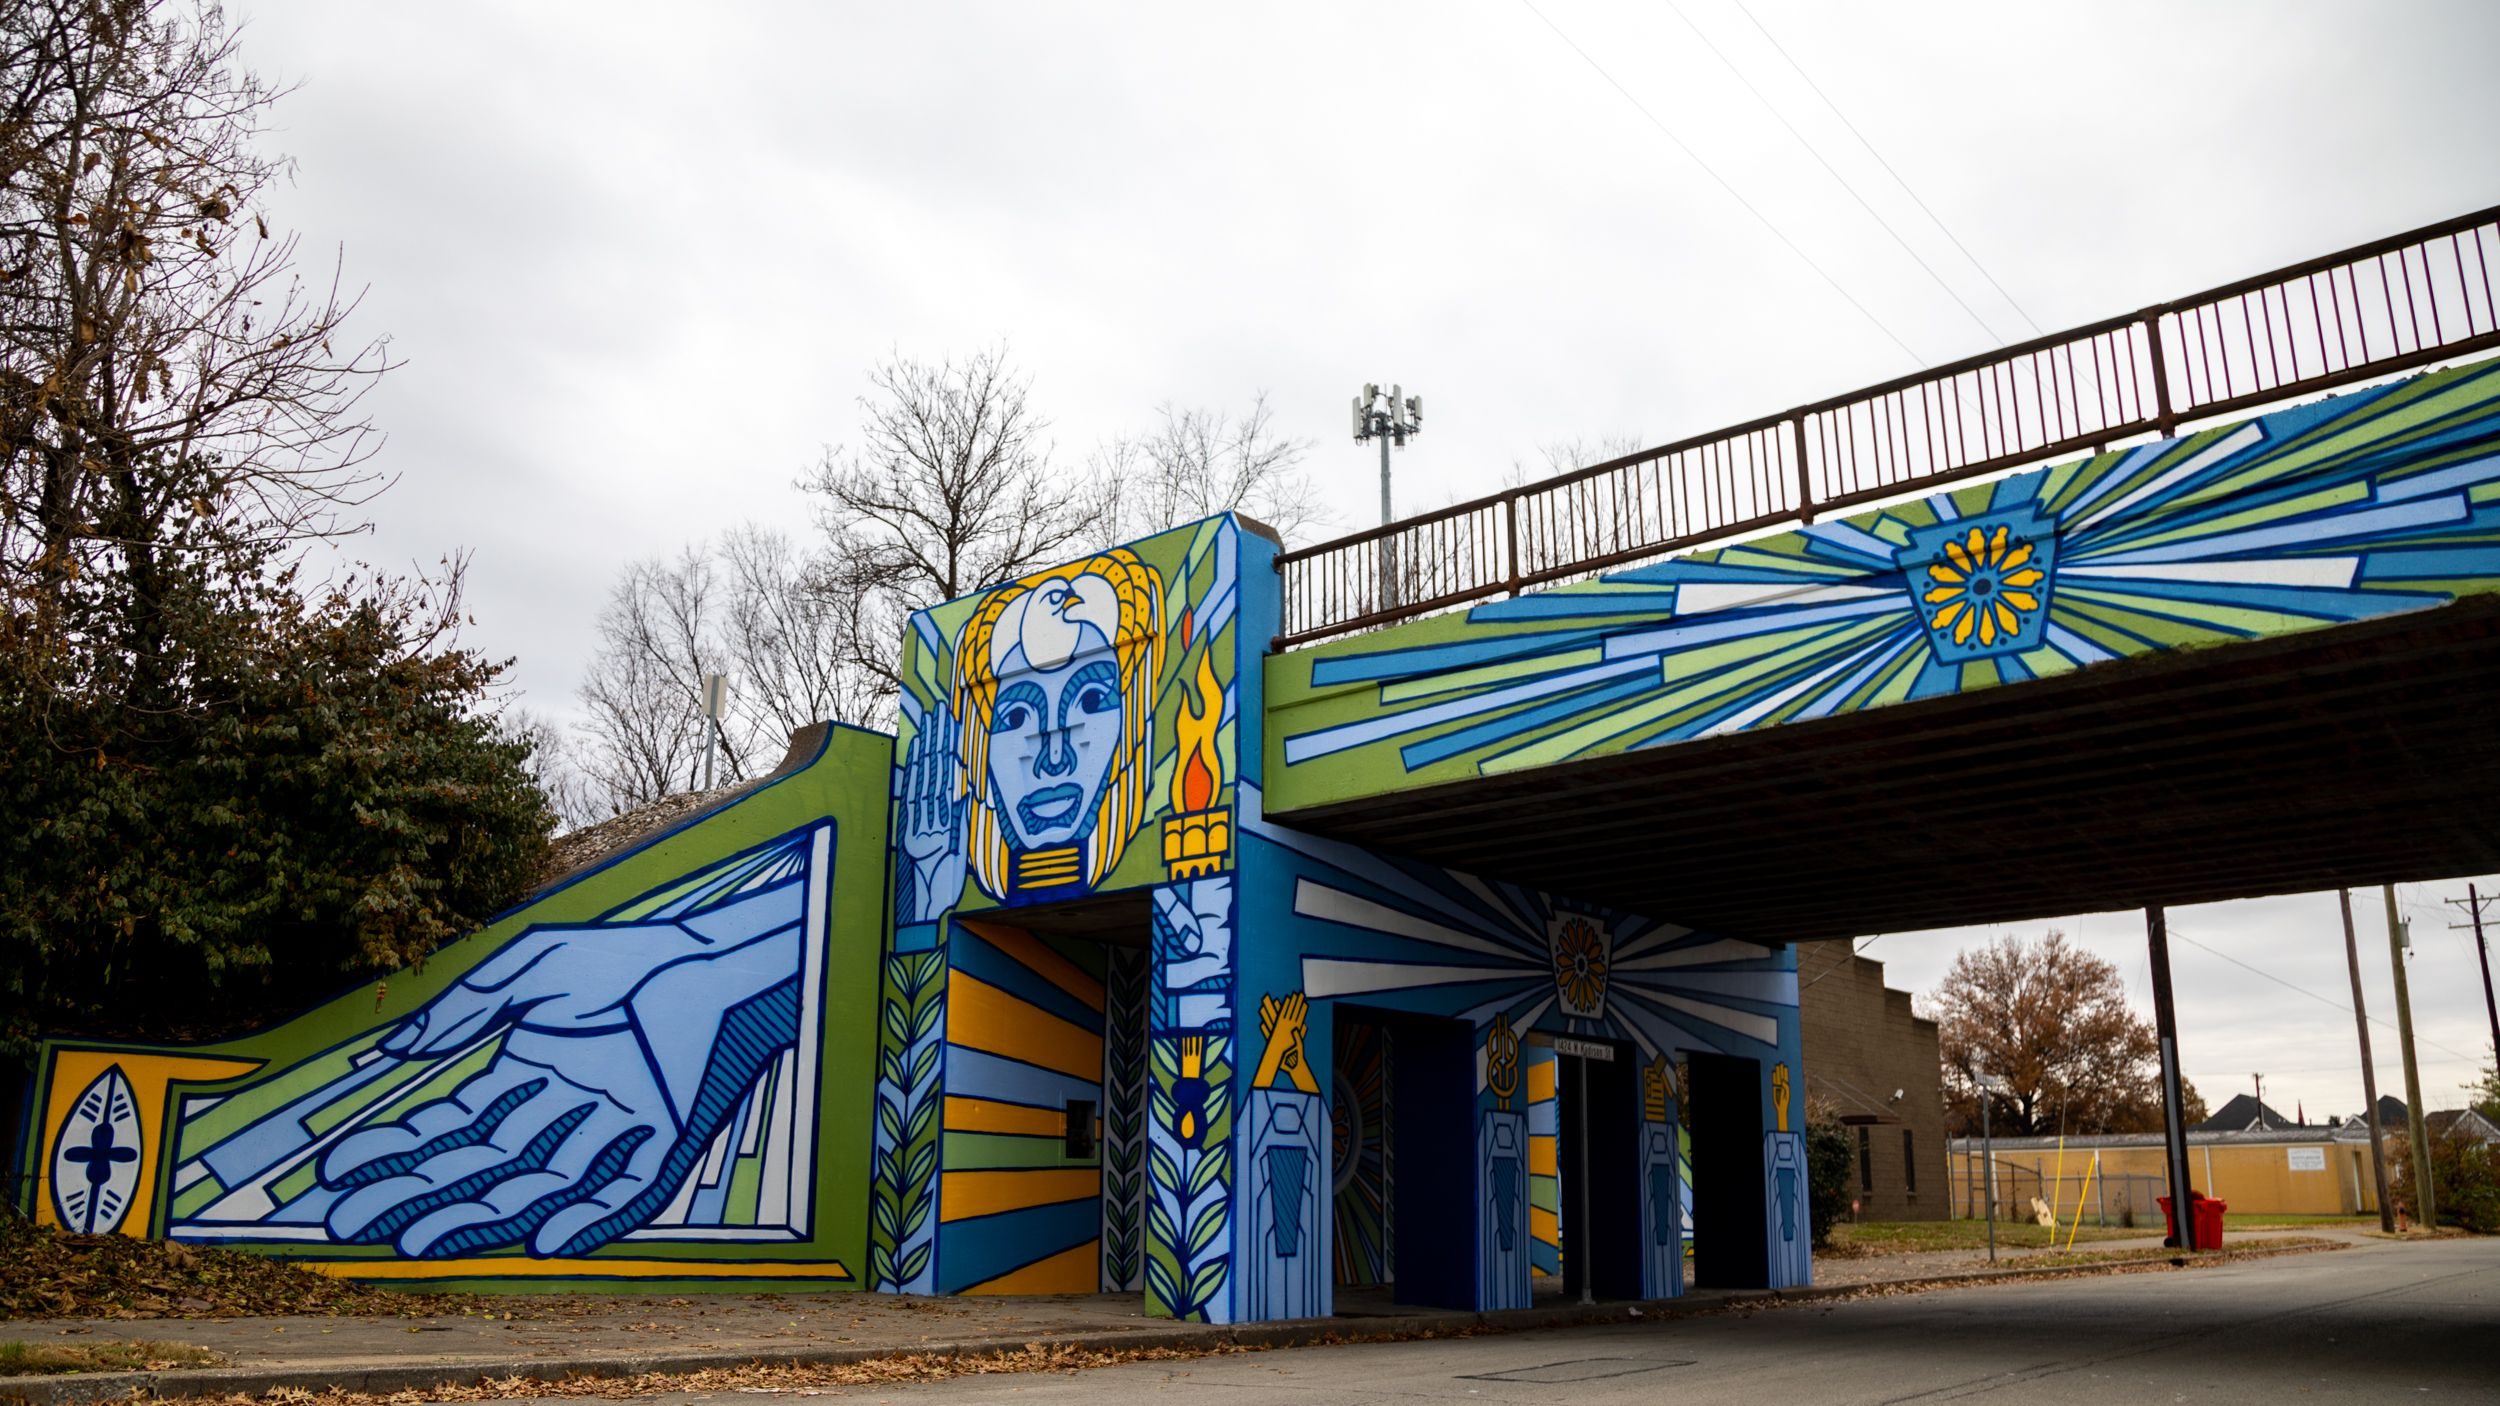 temple-of-community-mural-5.jpg